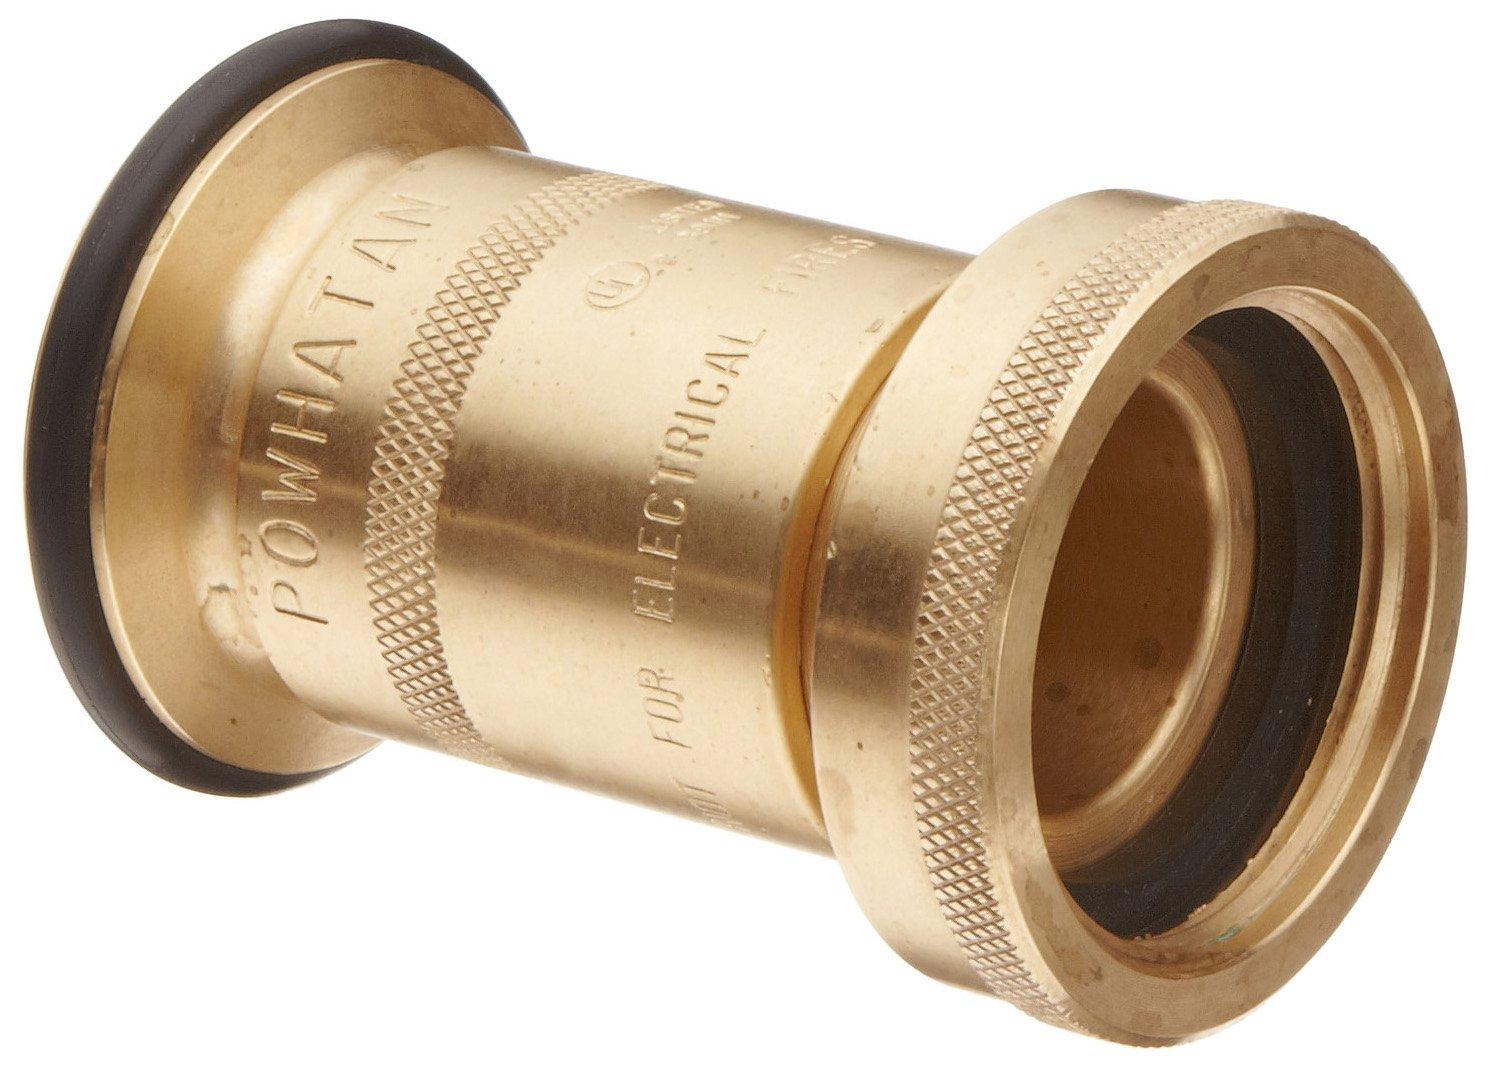 Dixon BFN150NST Brass Fire Equipment, Industrial Fog Nozzle, 1-1/2'' NST (NH) Thread, Box of 10